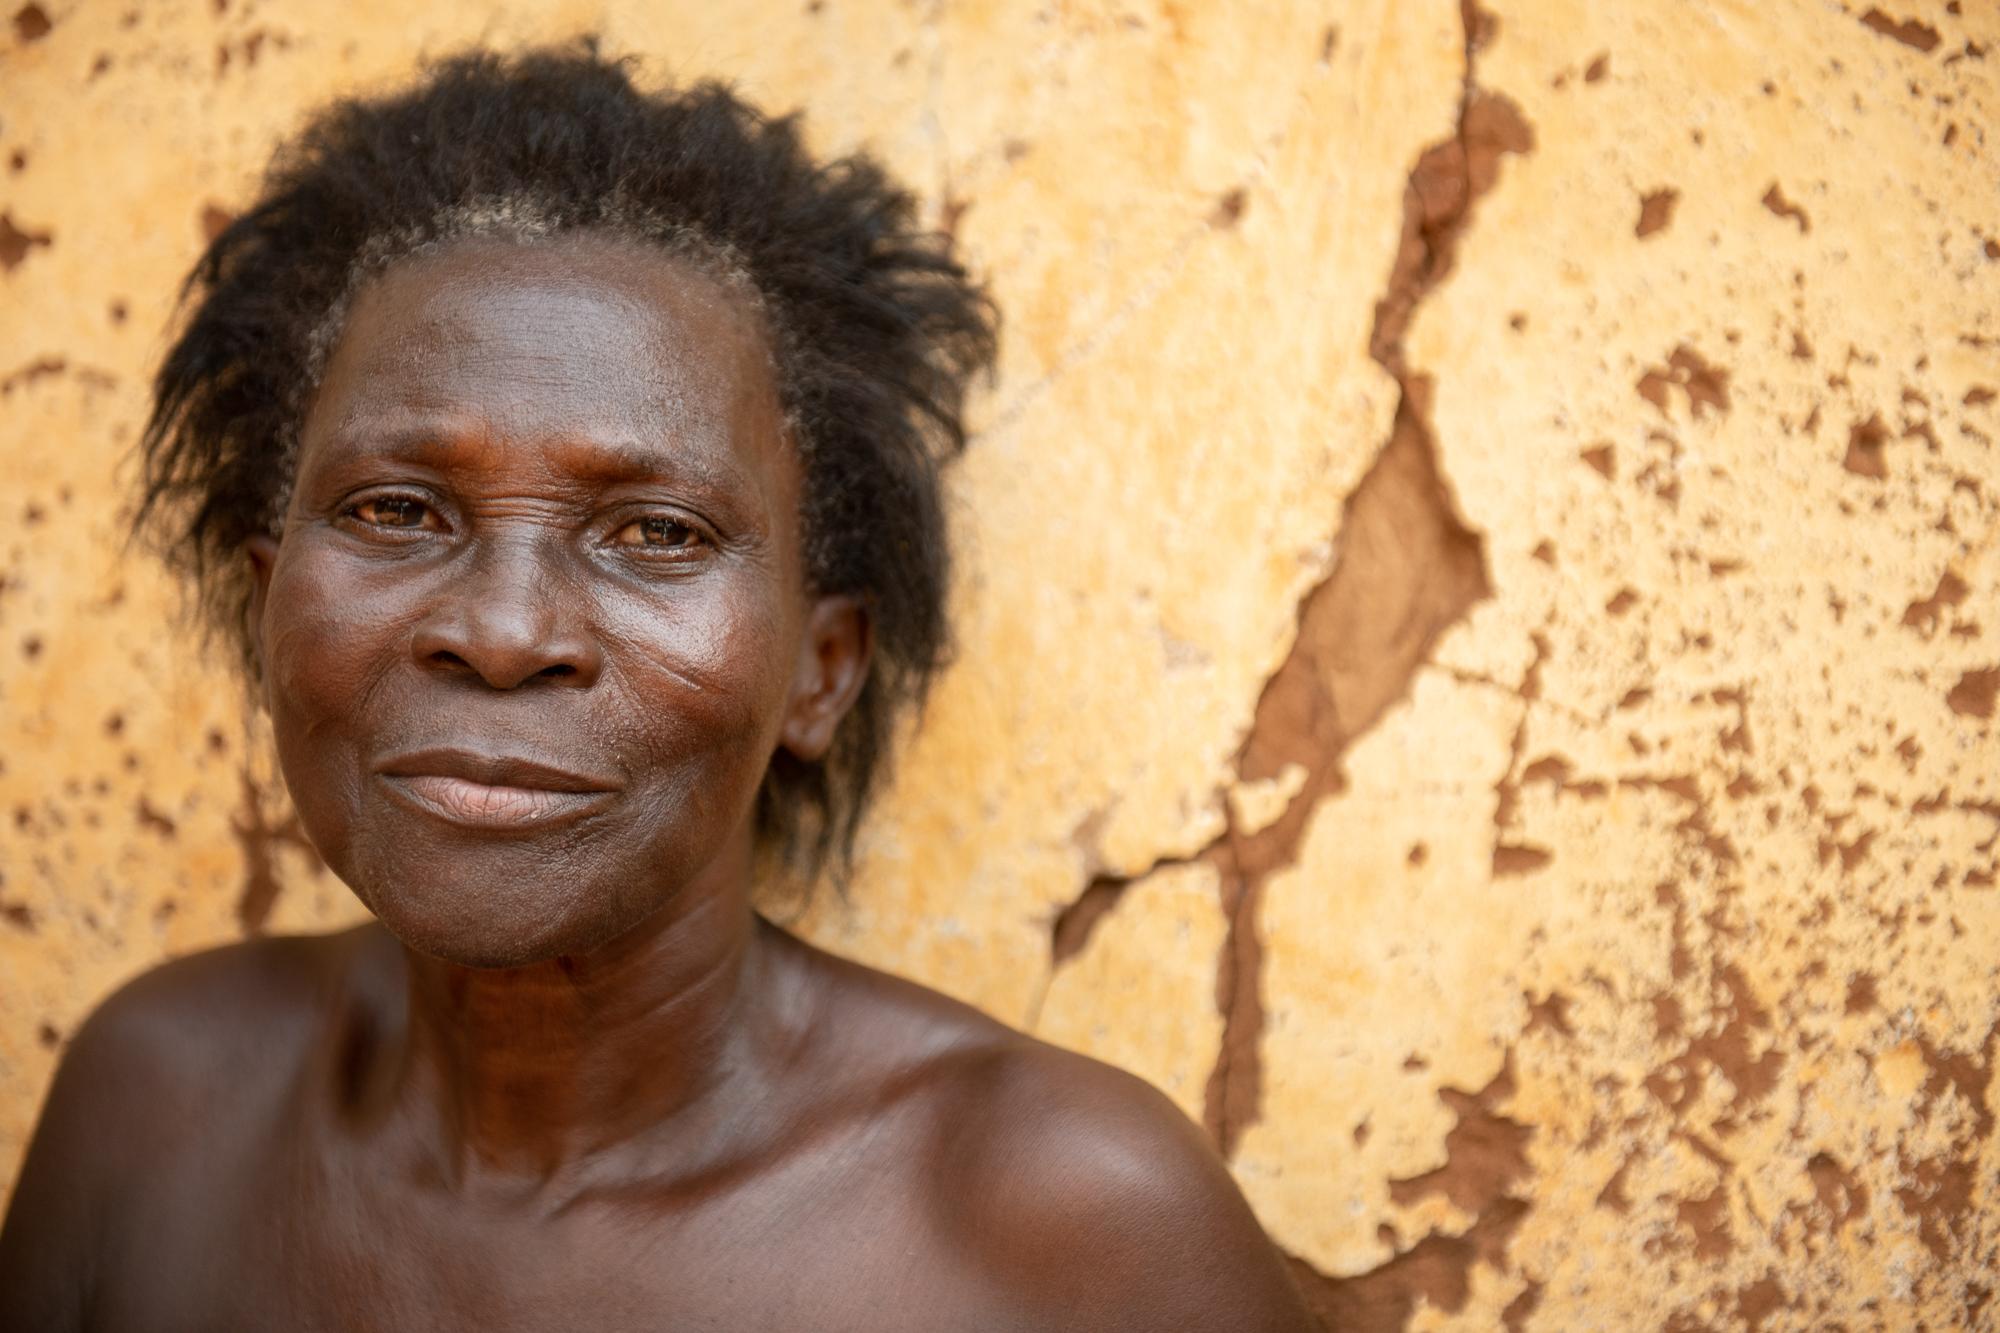 Villager. Amenouvikondji, Togo